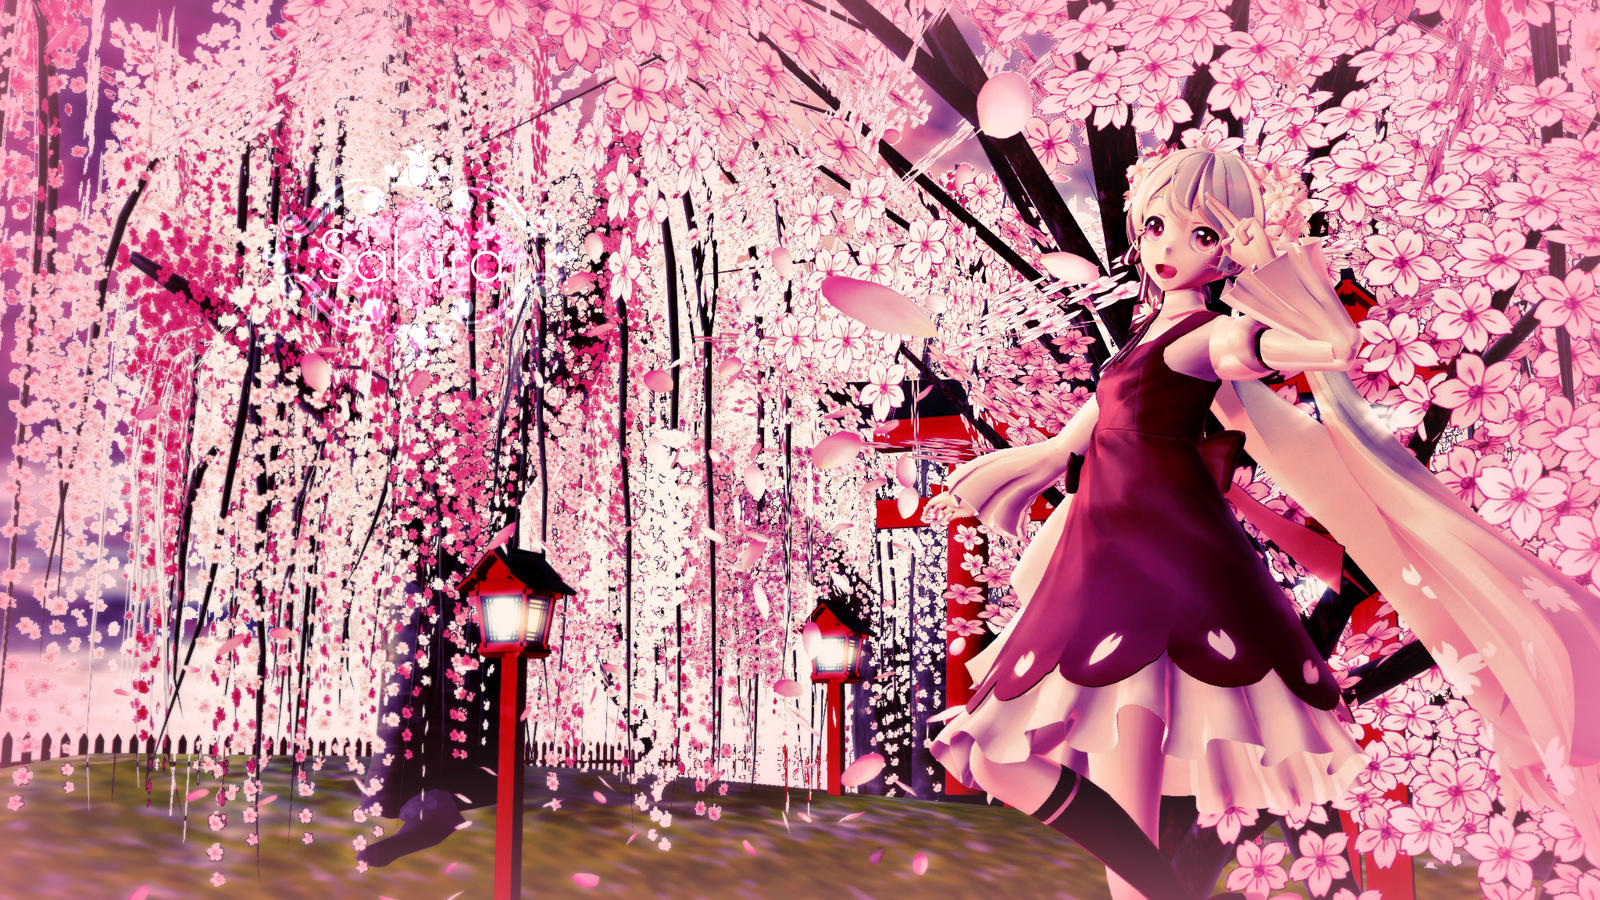 sakura wallpaper girls anime - photo #43